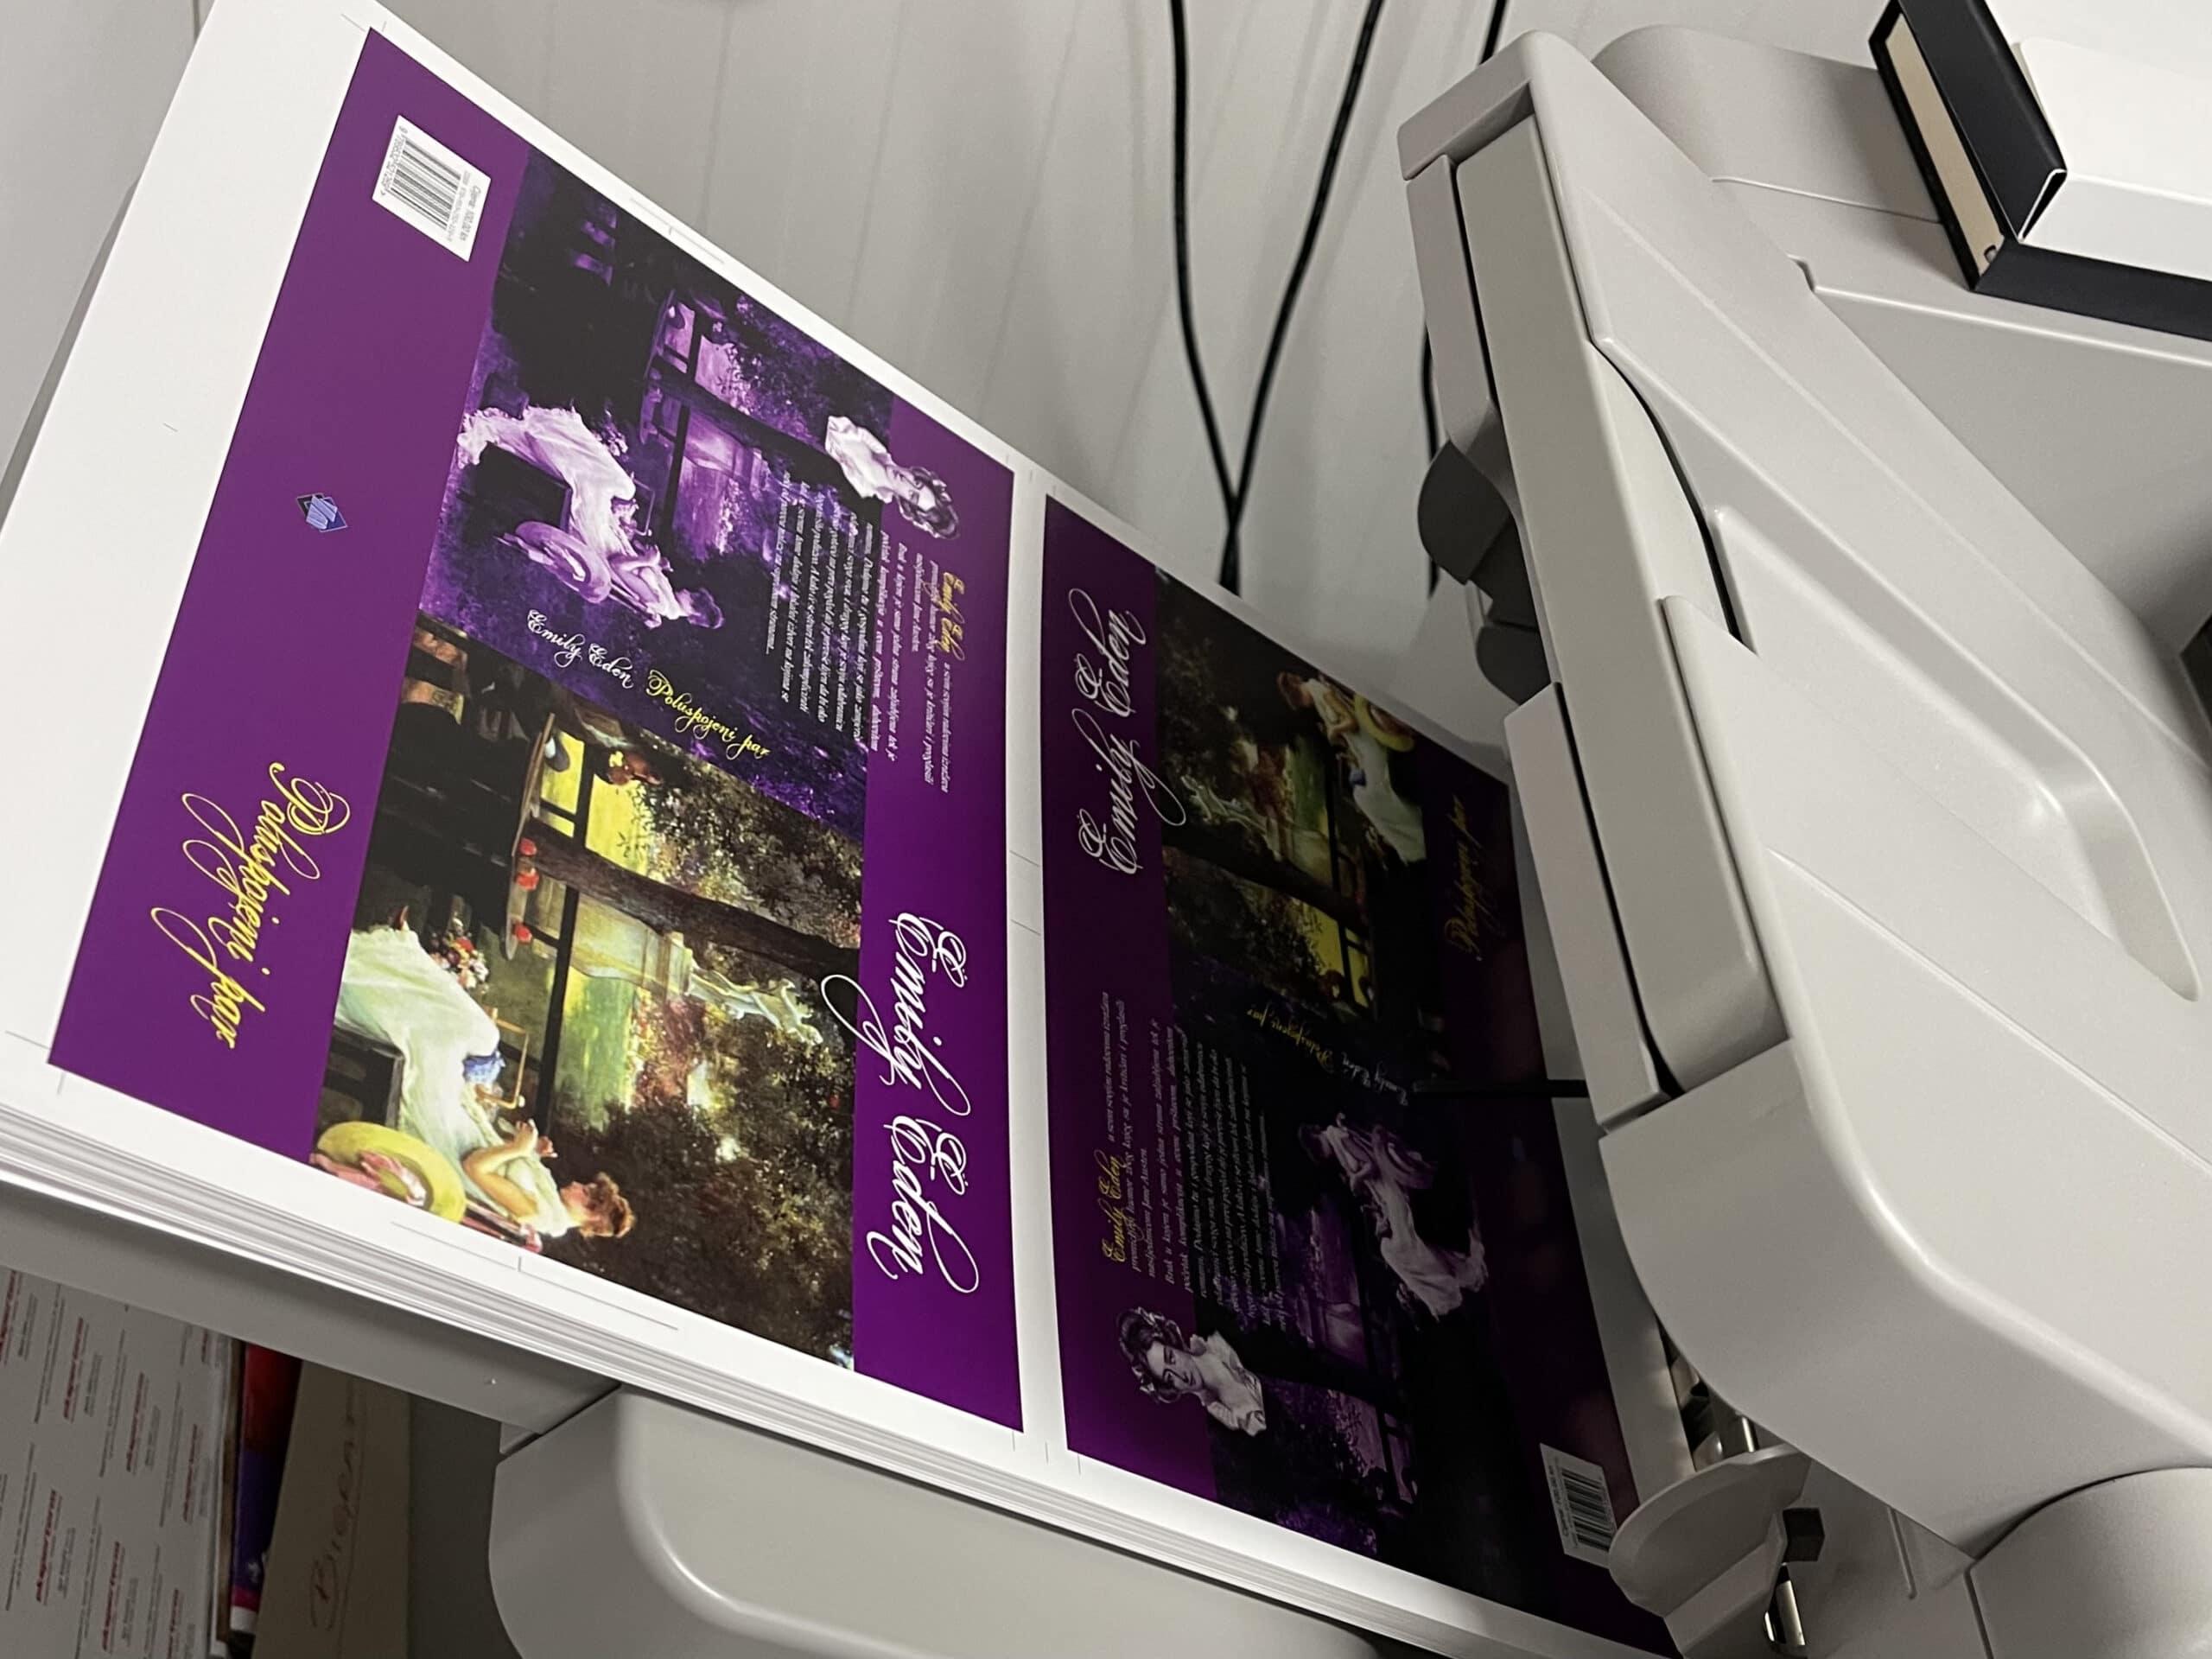 Digitalni tisak korice knjige